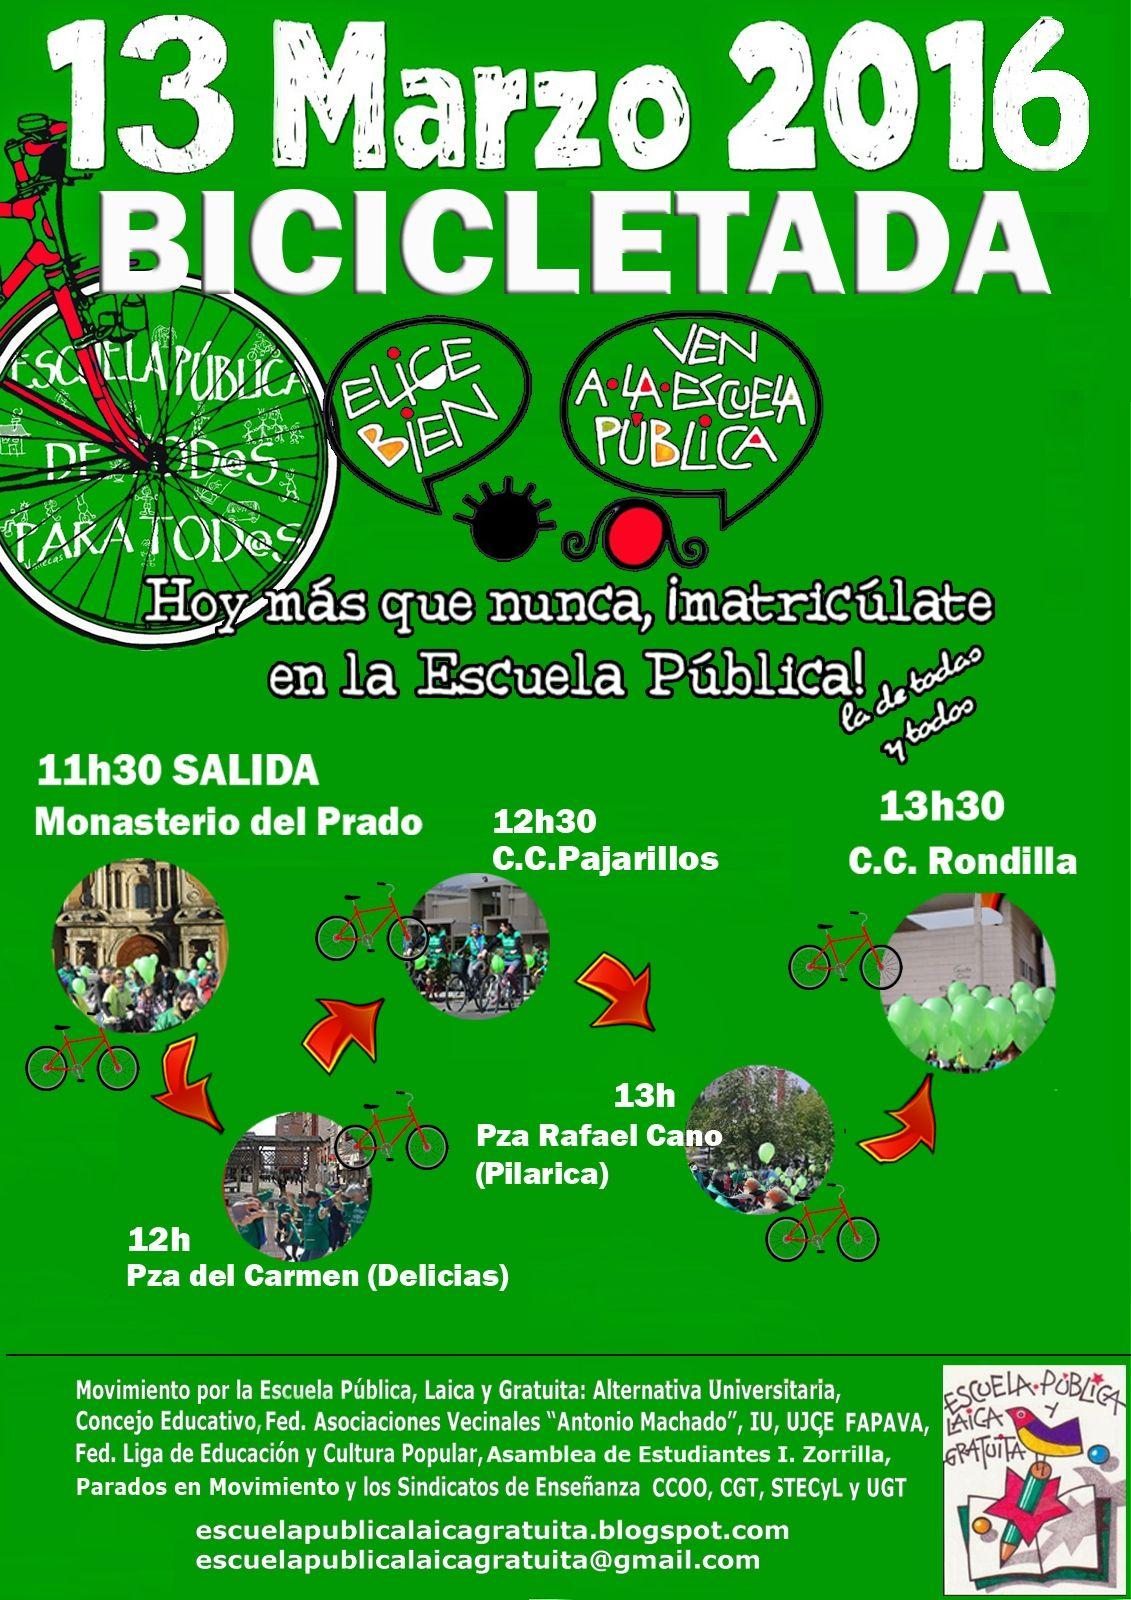 bicicletada 2016 para cartel